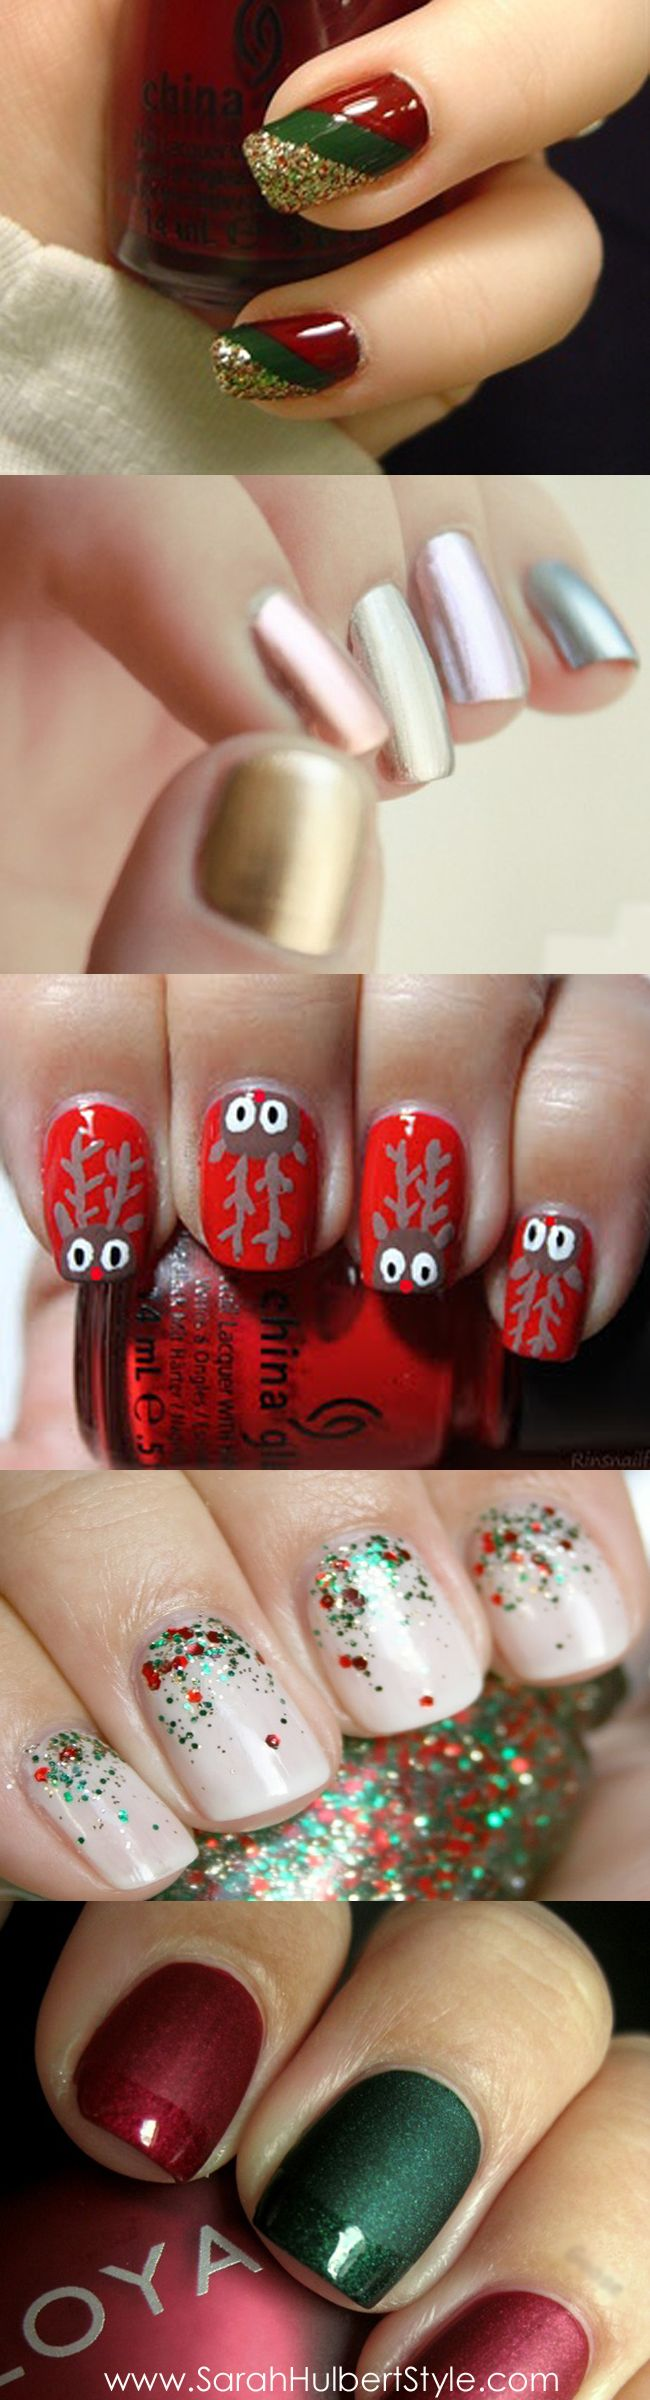 Holiday Party Style: Festive Manicures #mani #nailpolish Nail Design ...